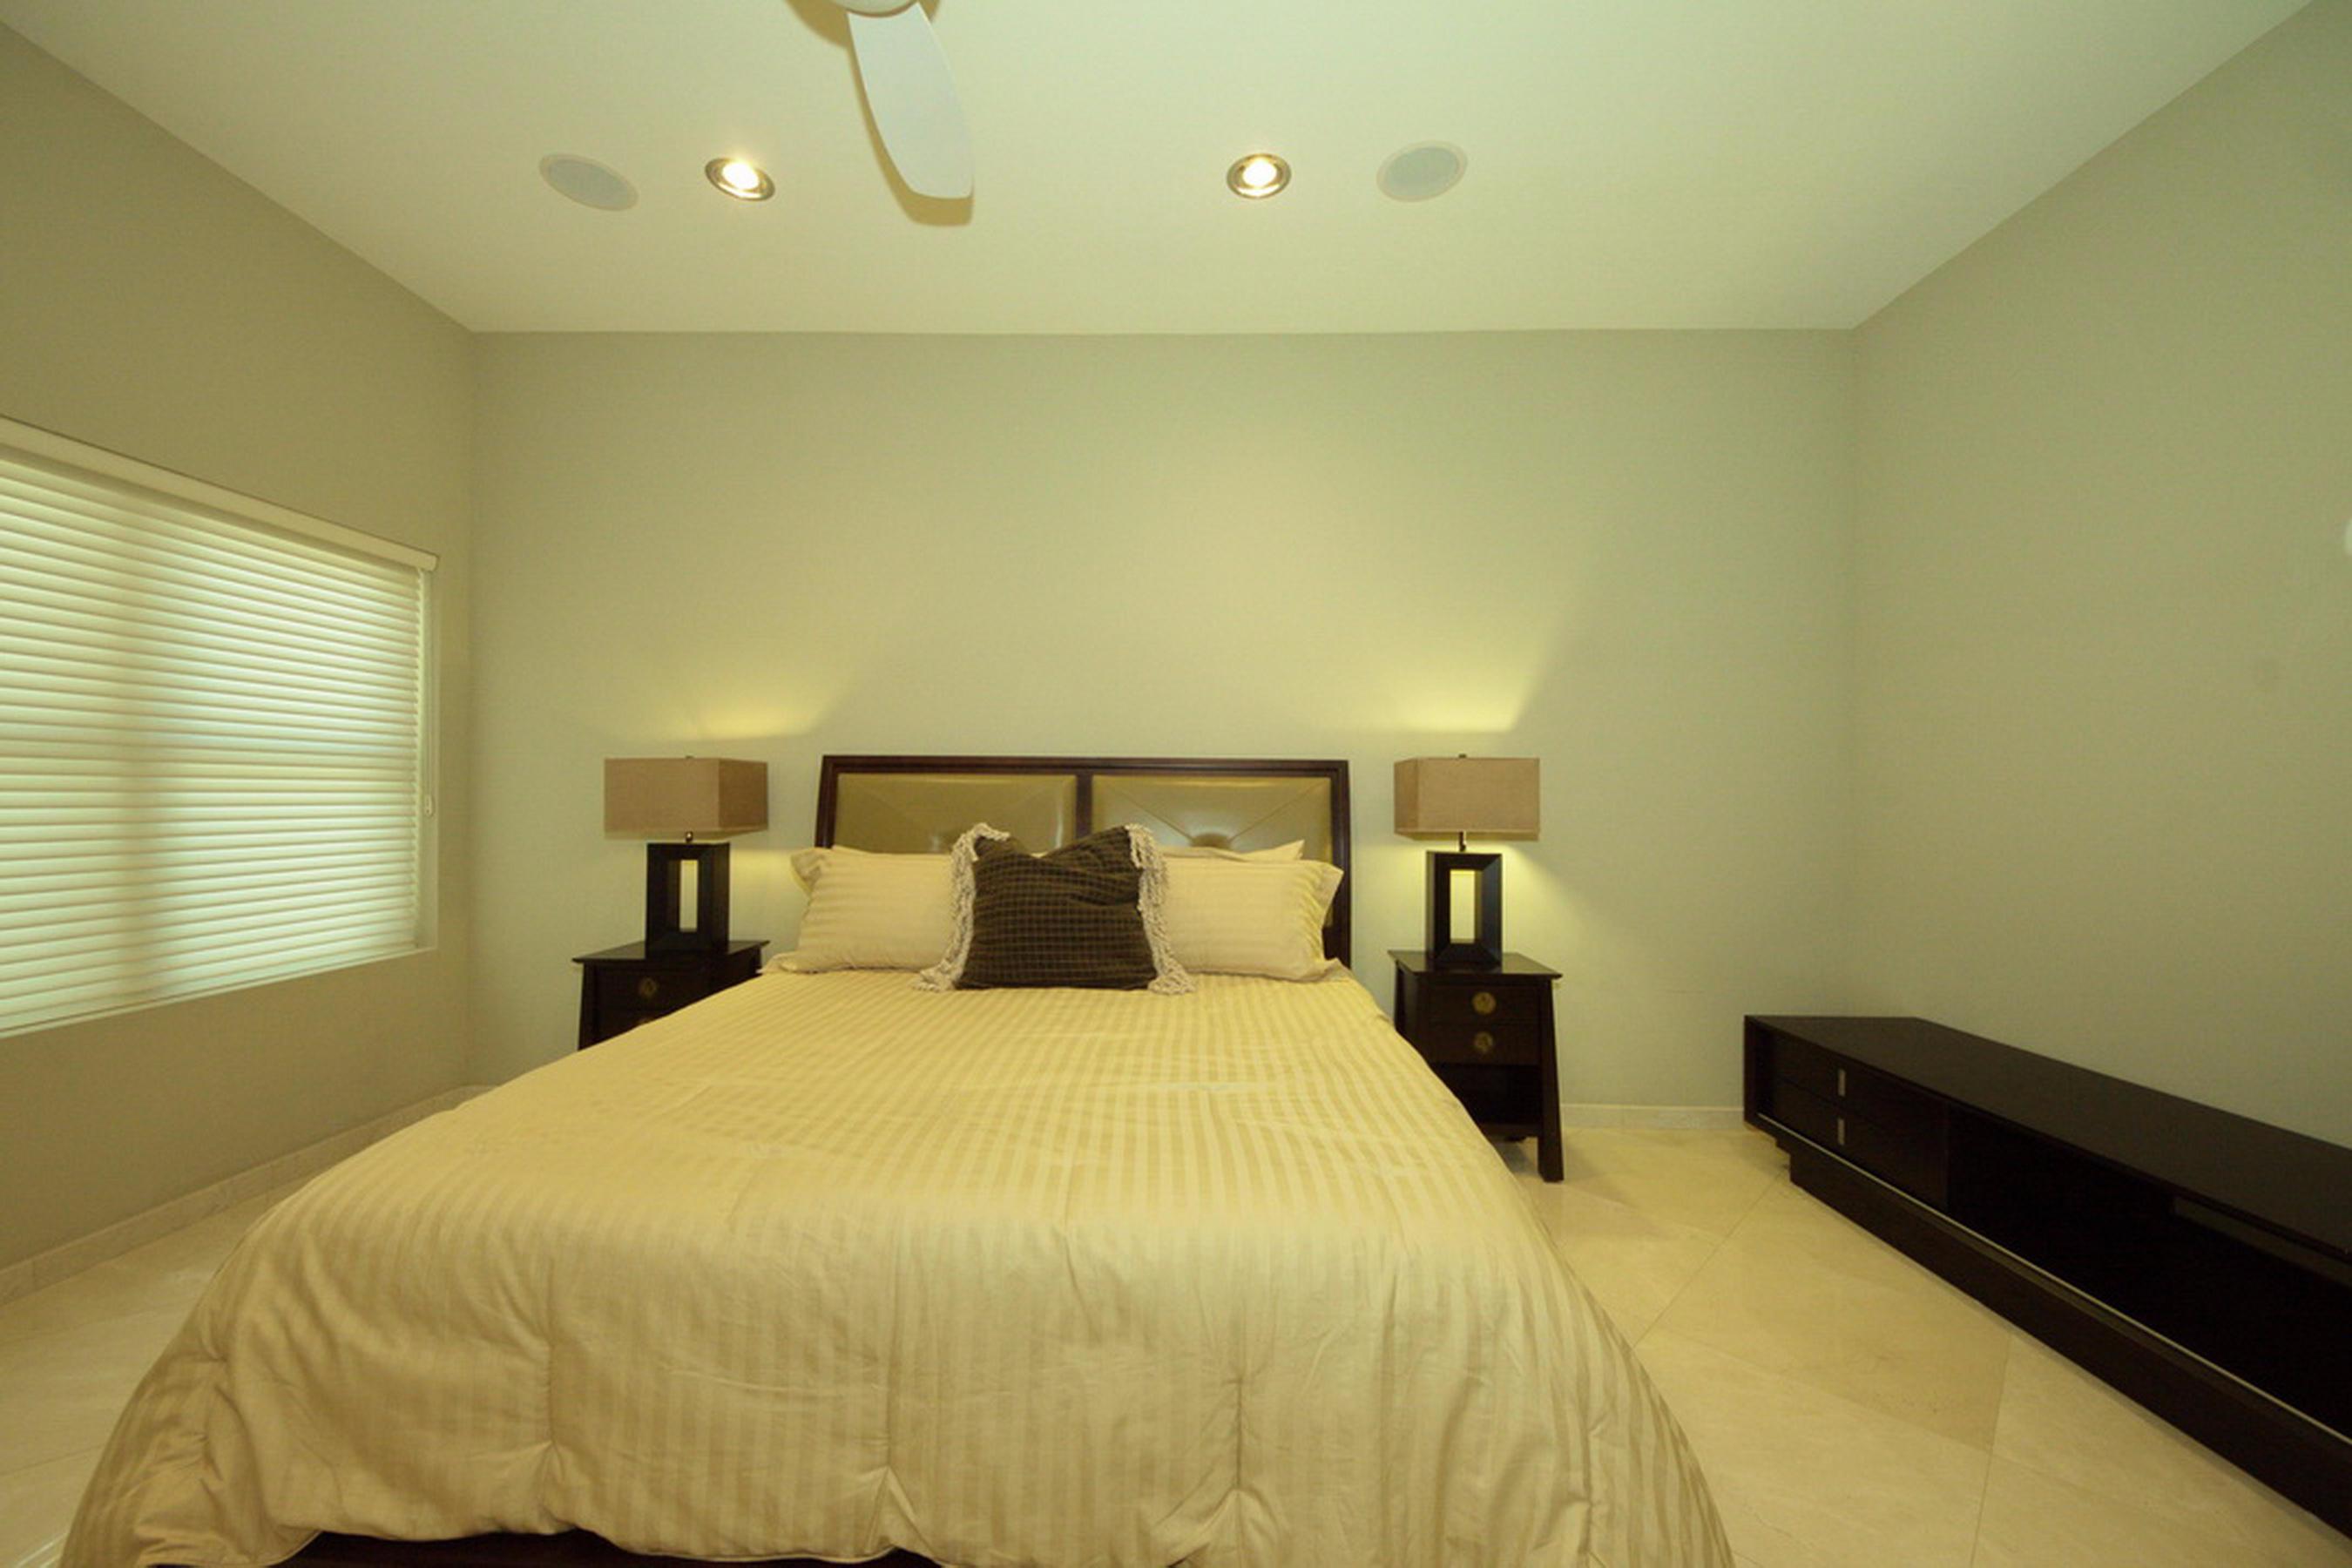 16-Guest Bed Room P1